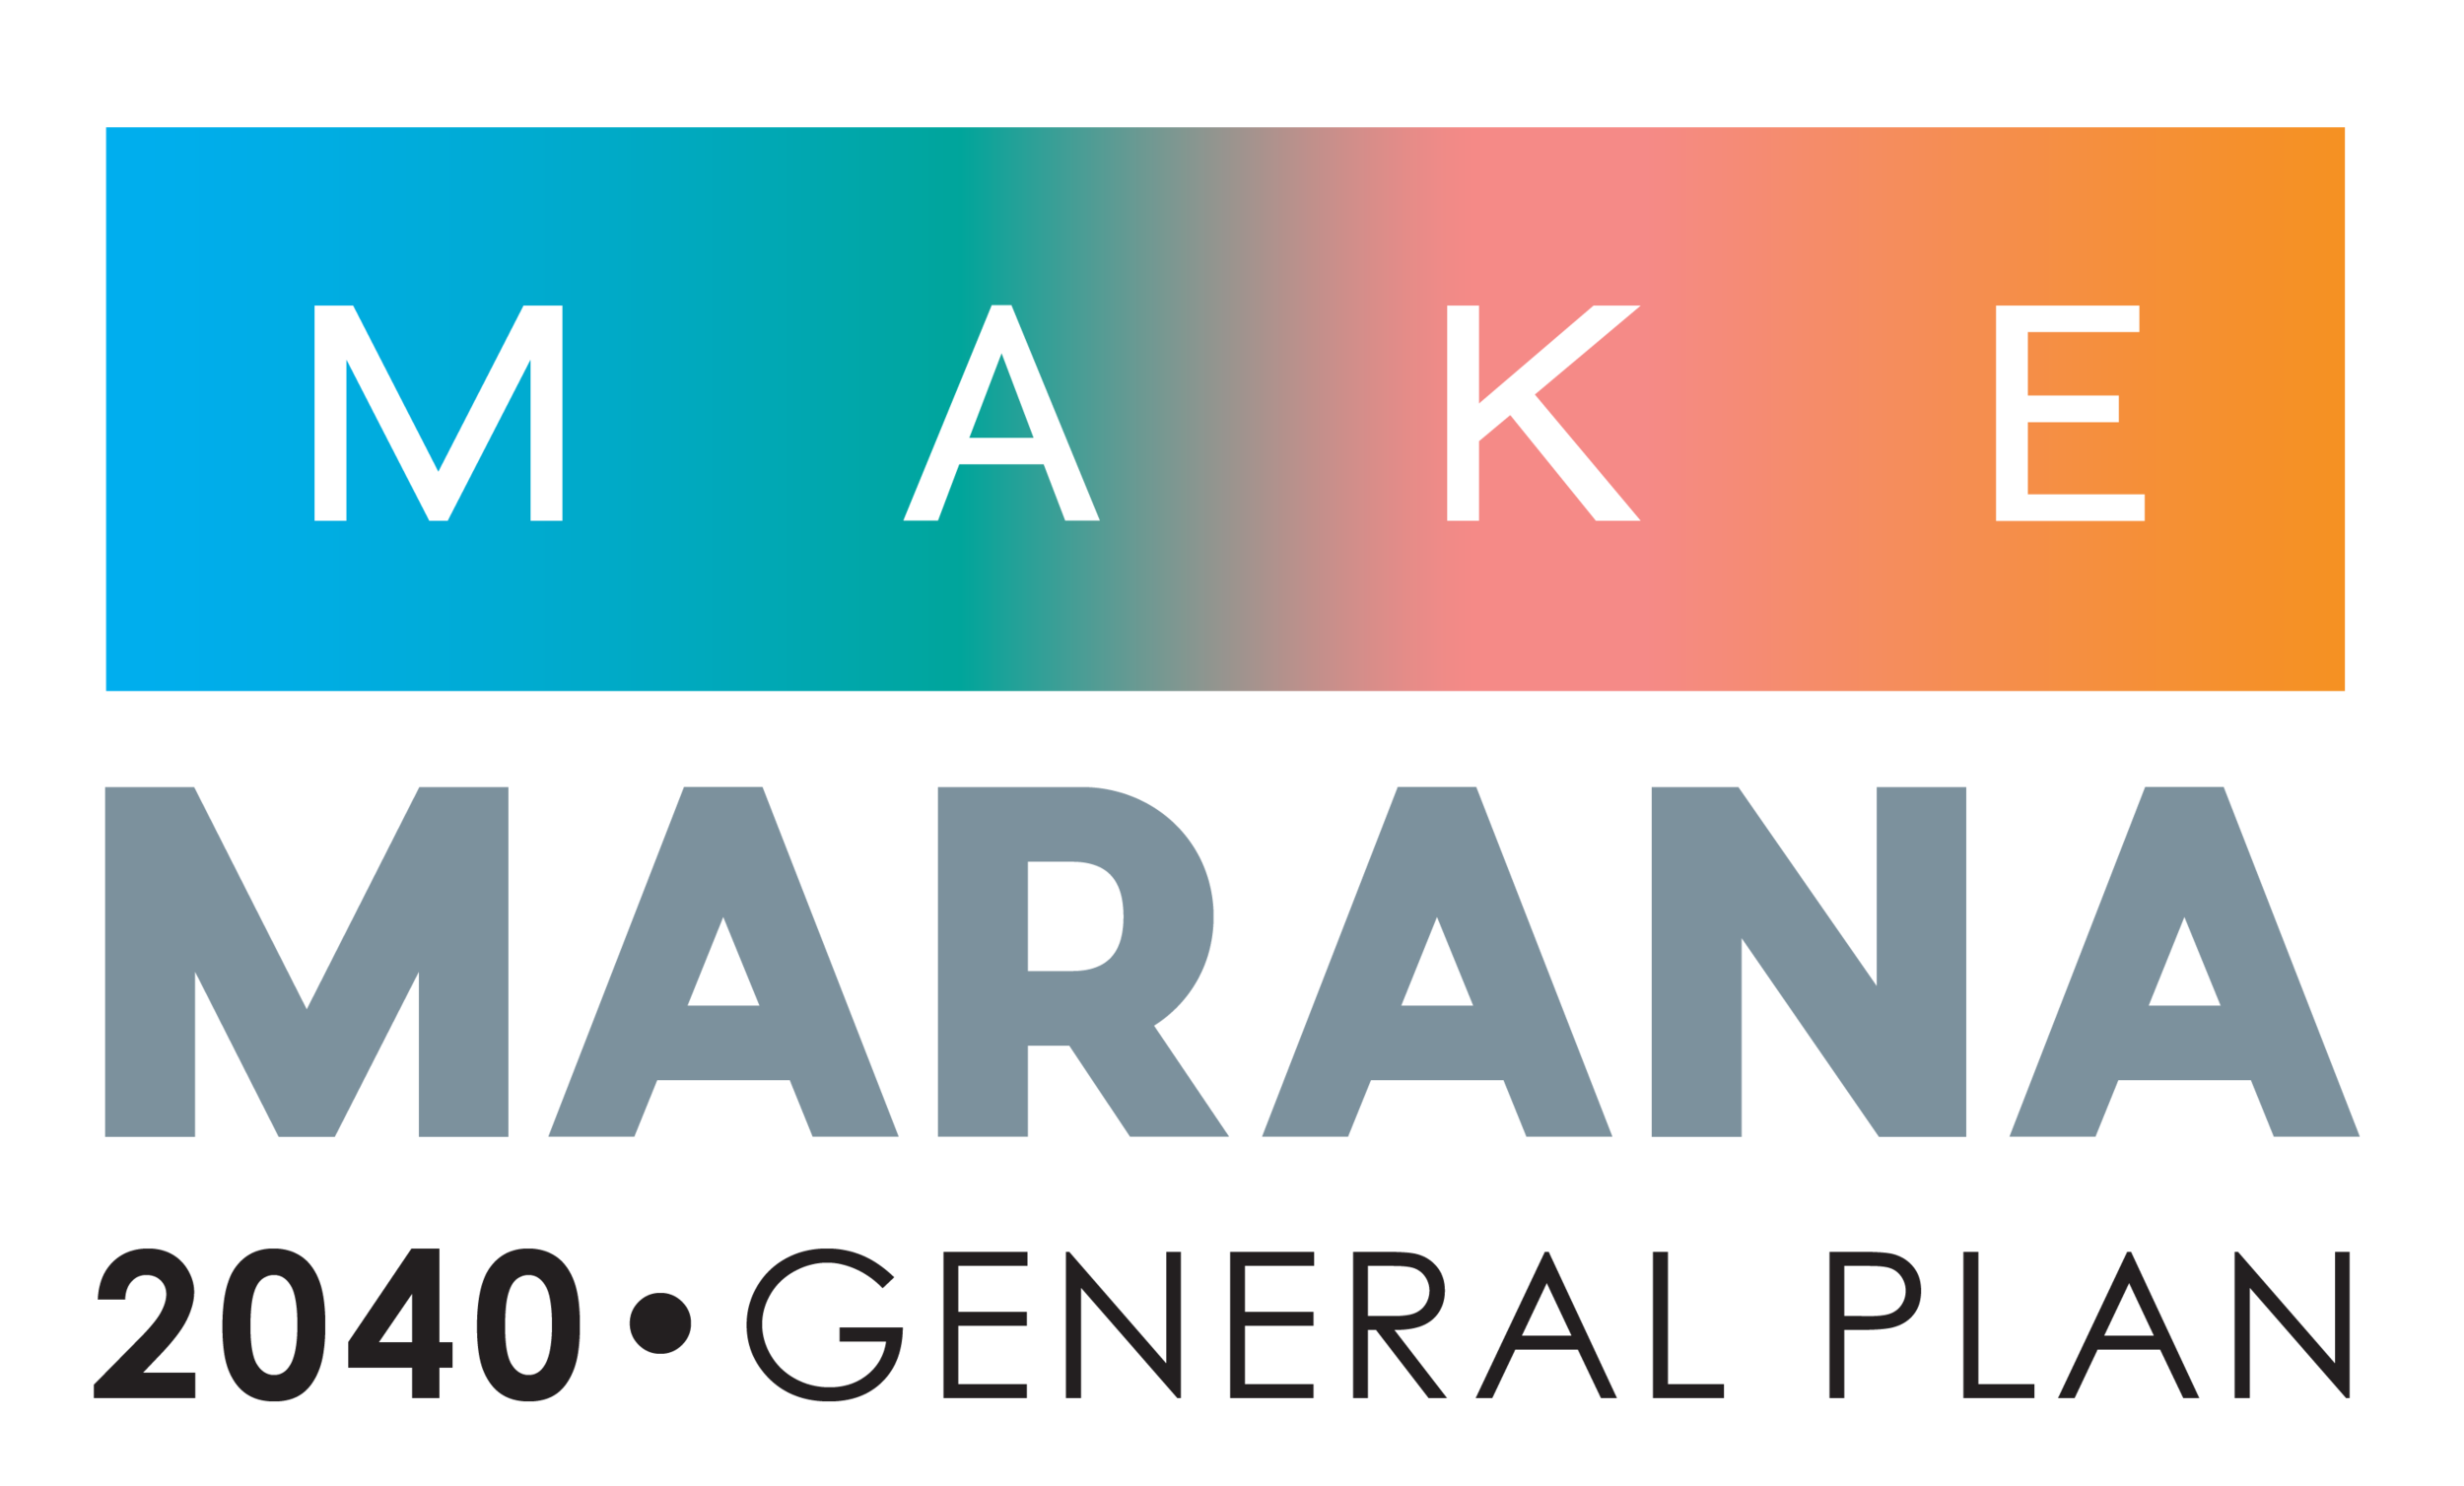 Make Marana 2040 Logo.png